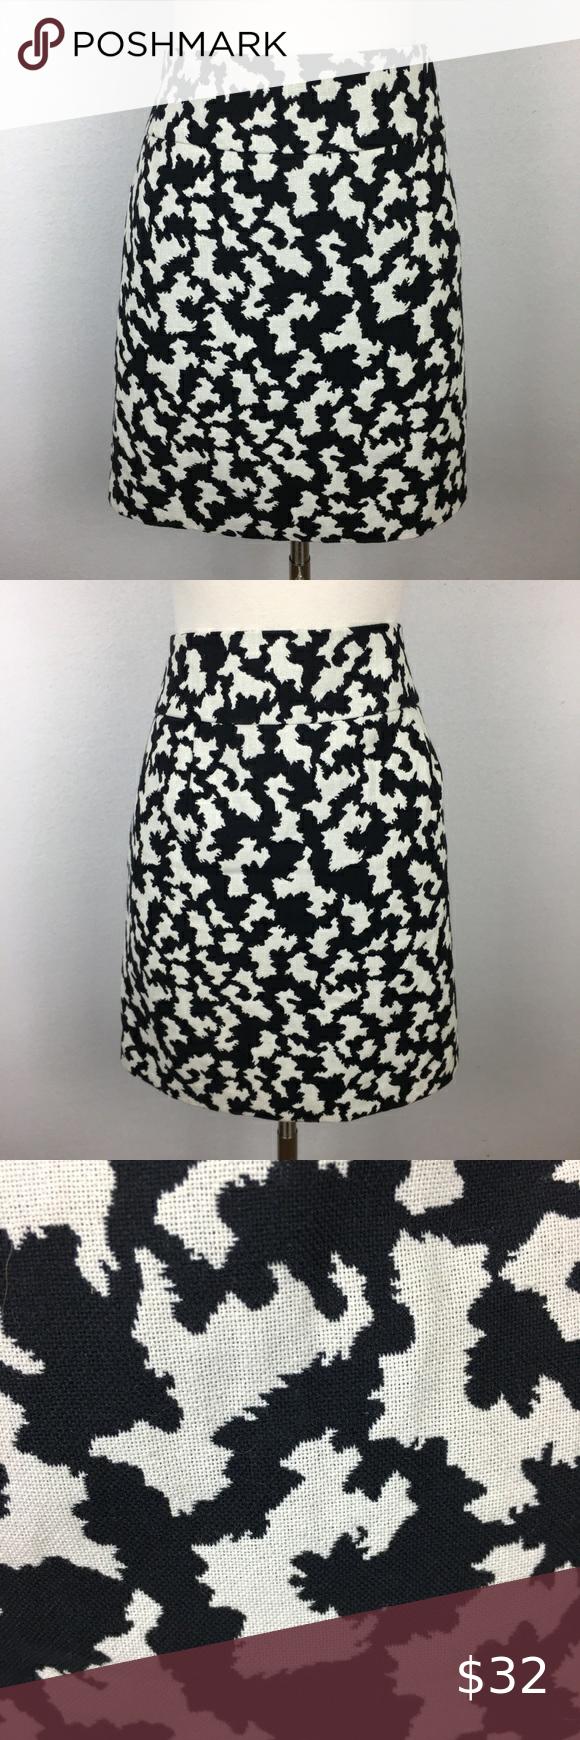 Loft Outlet NWT Black & White Print Skirt 10 Loft Outlet NWT Black & White Print Skirt 10 lined white is more of a natural white  16.5